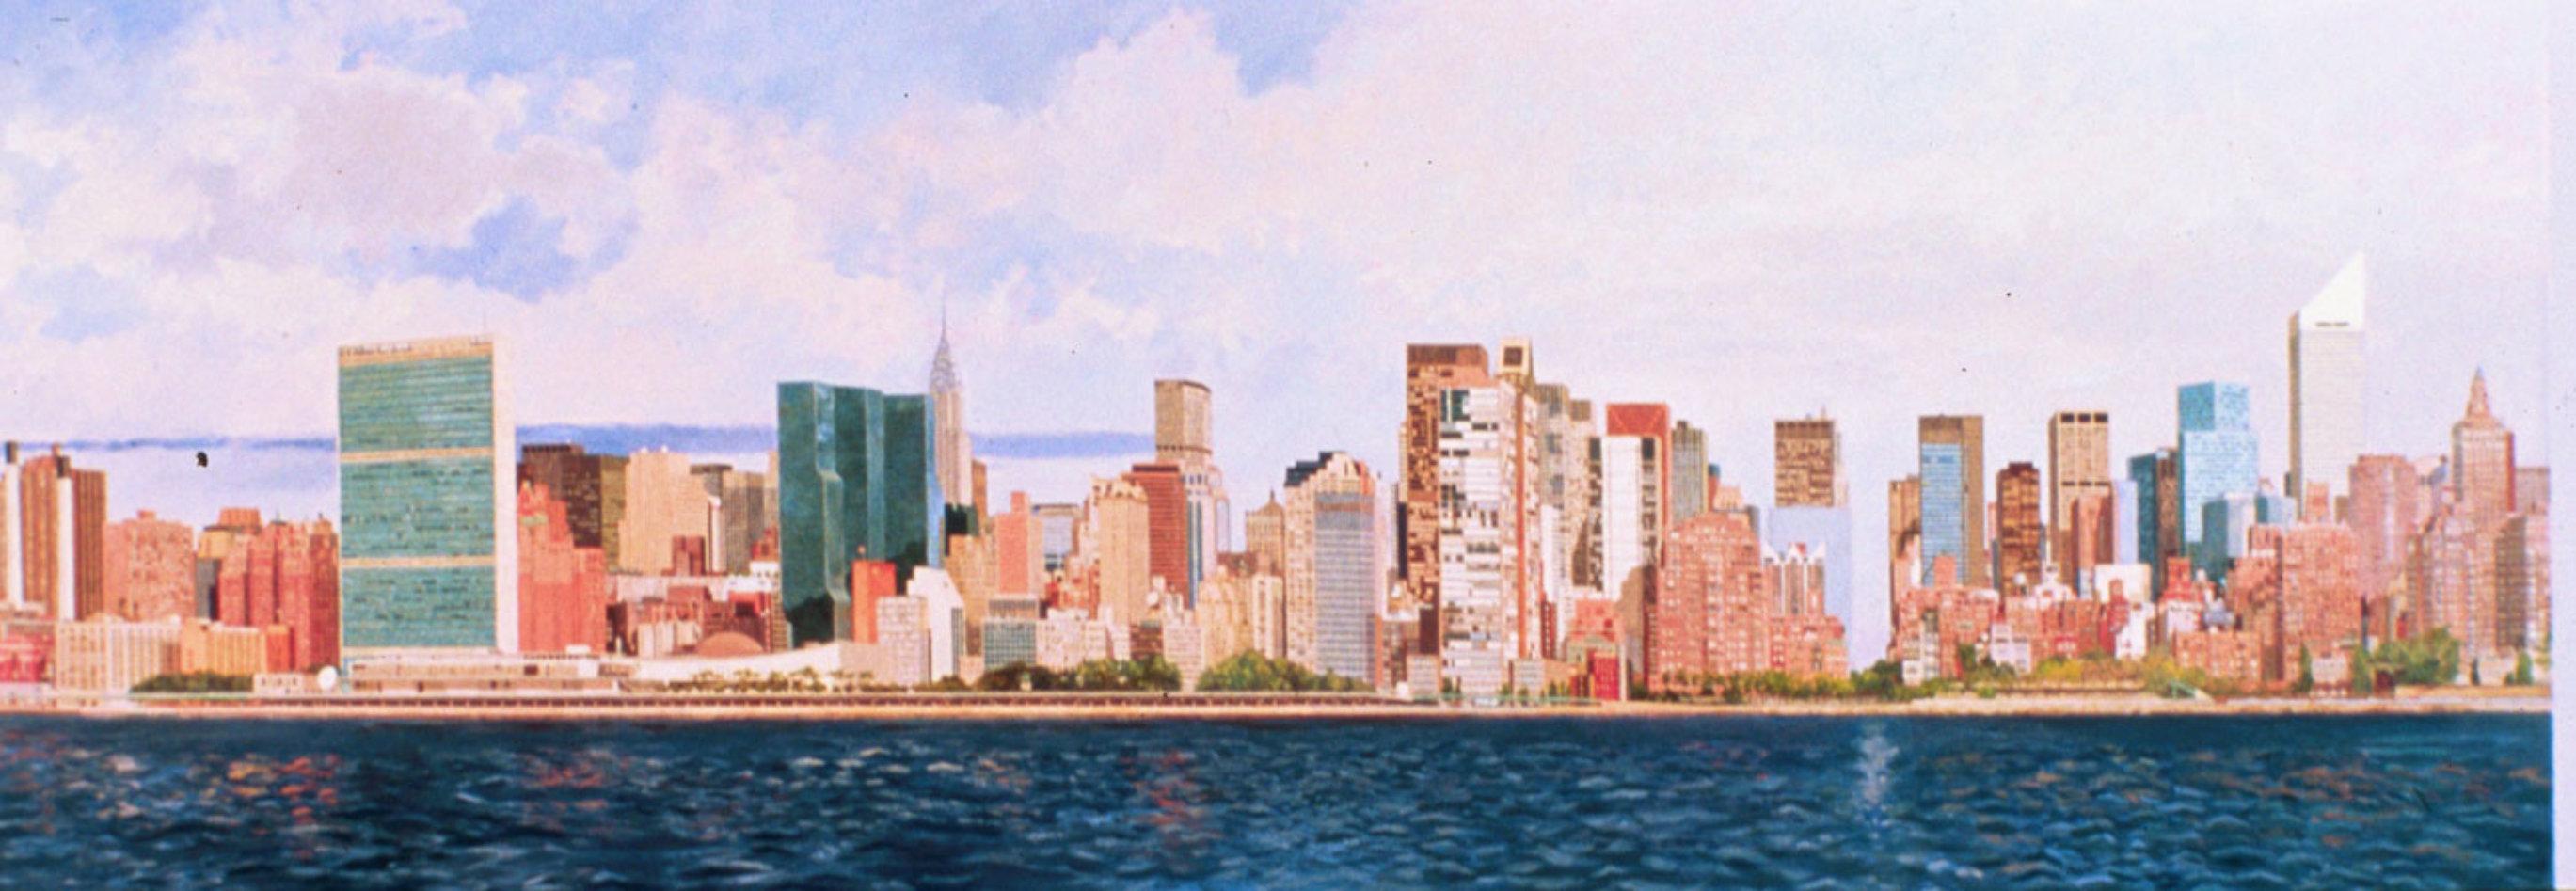 East Side Manhattan 2003 40x120 New York Mural Original Painting by Robert Solotaire